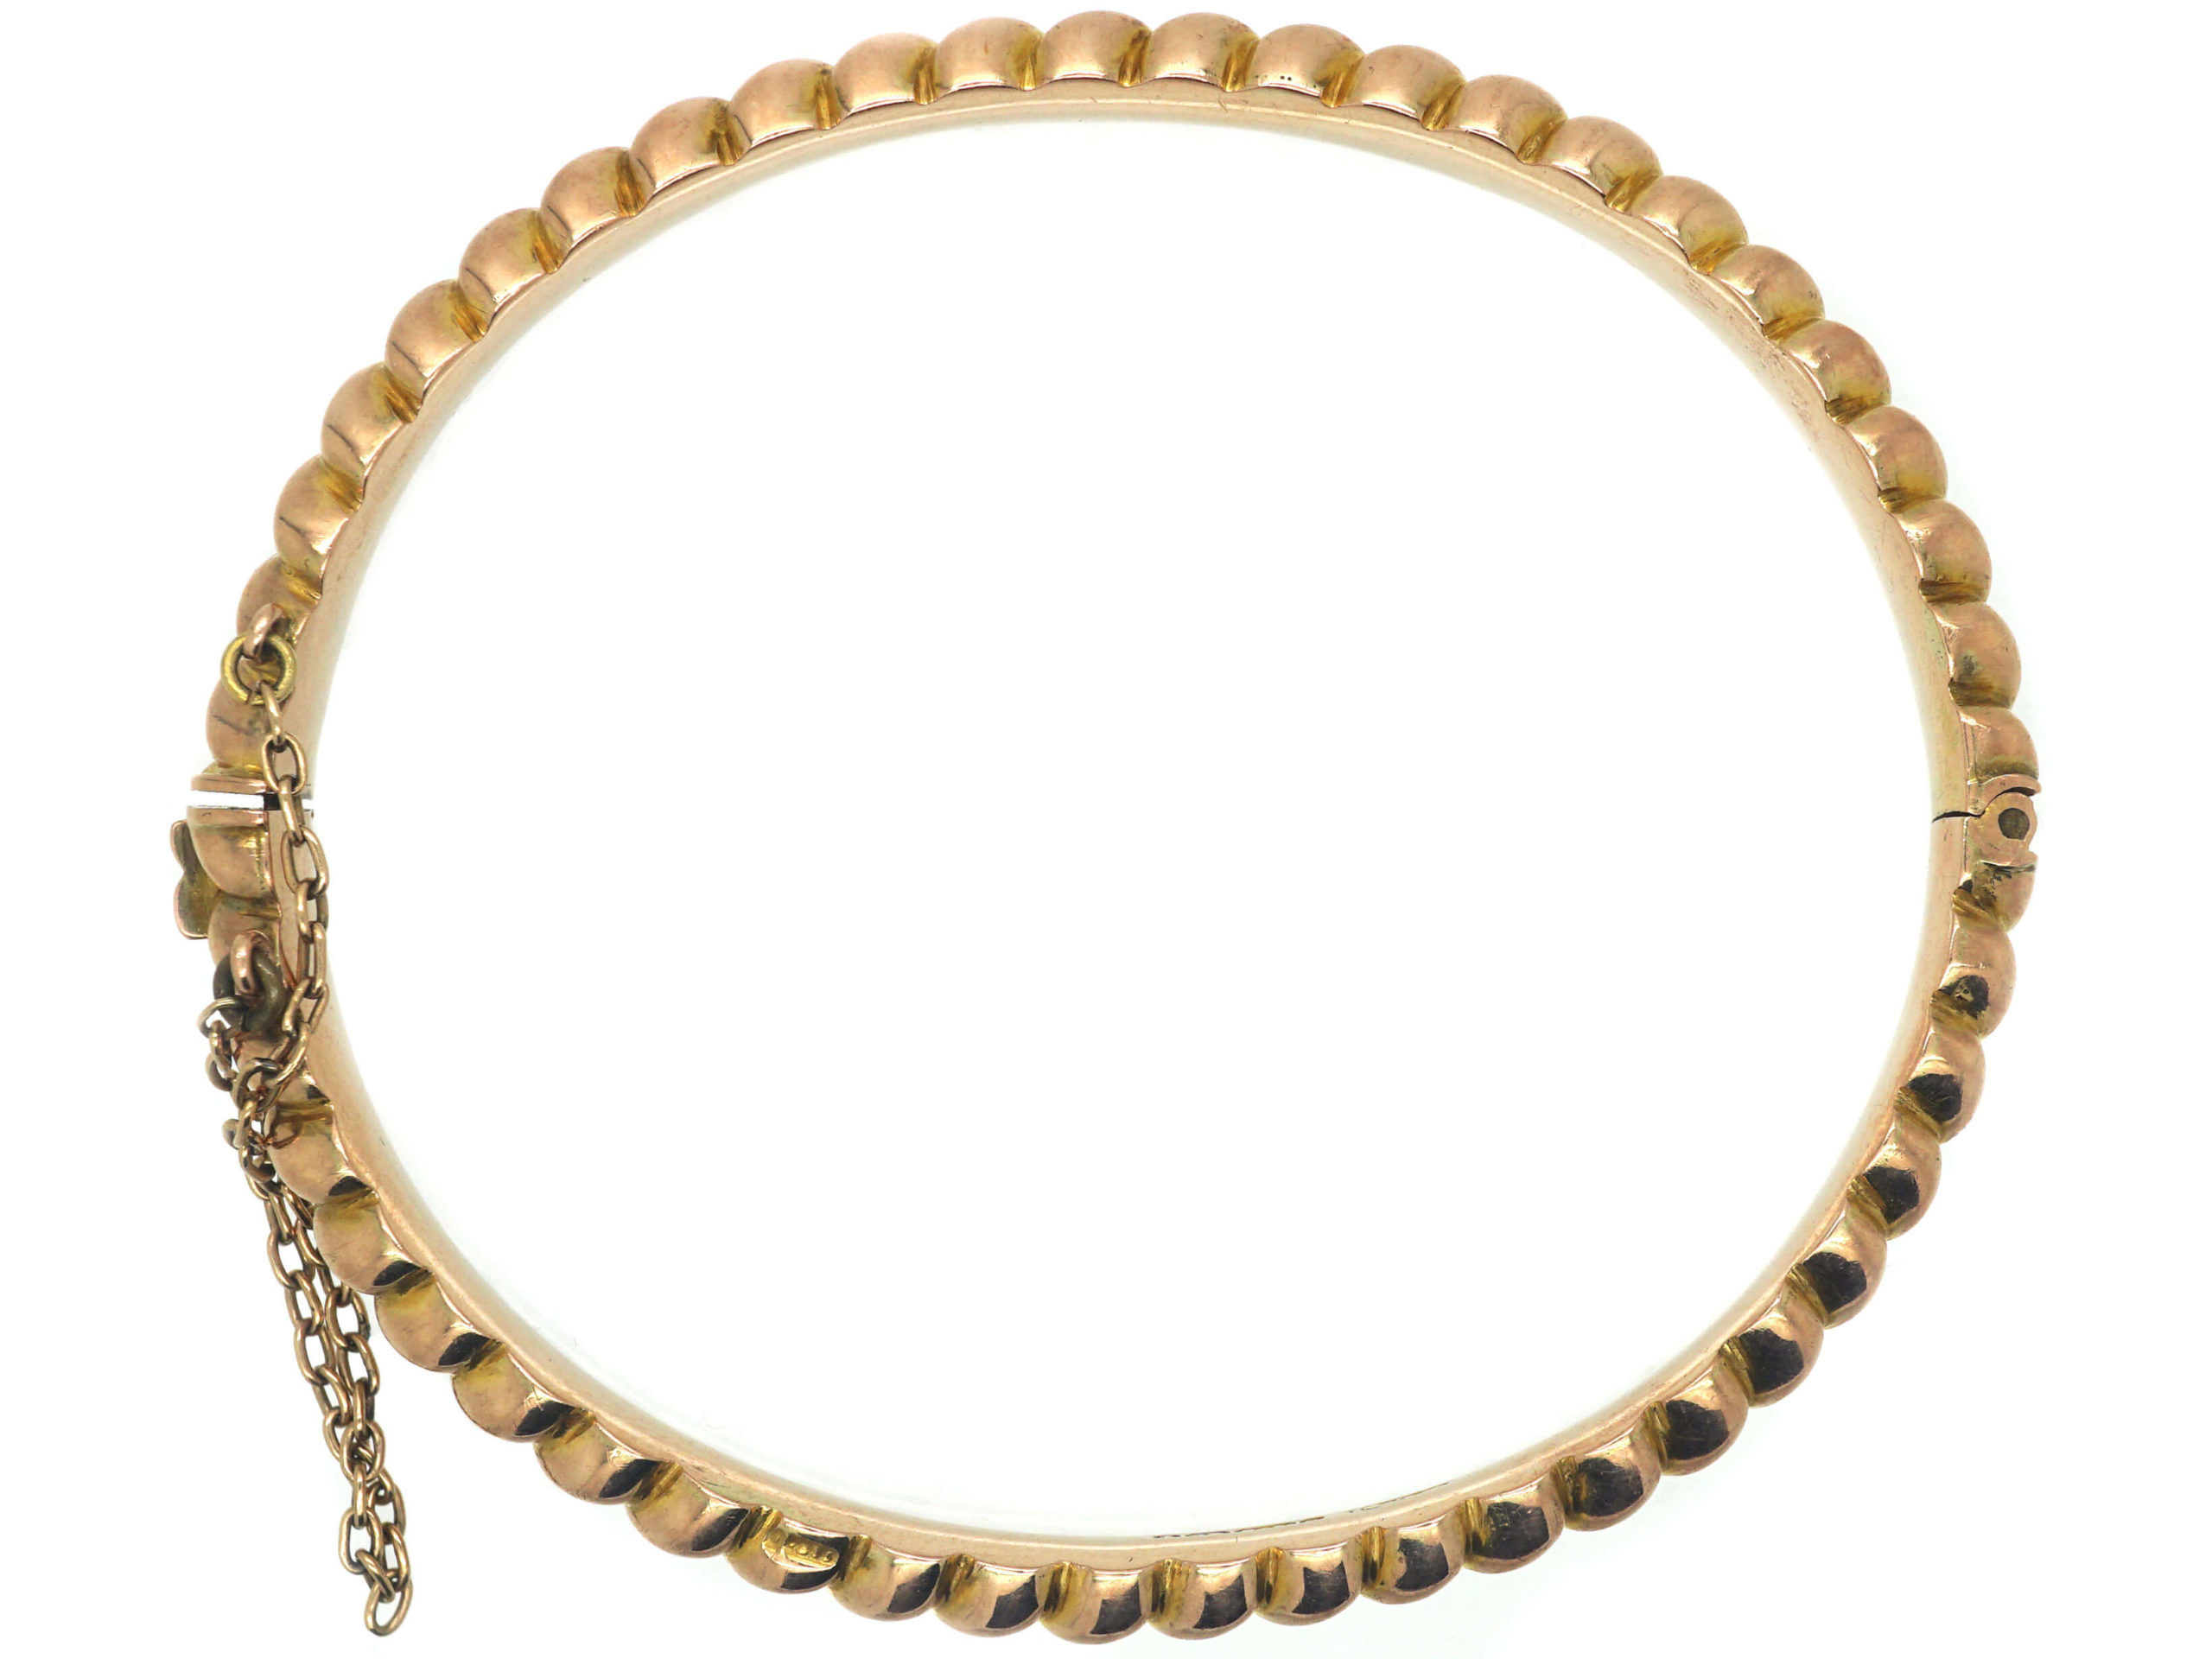 Victorian 9ct Gold Knot Design Bangle